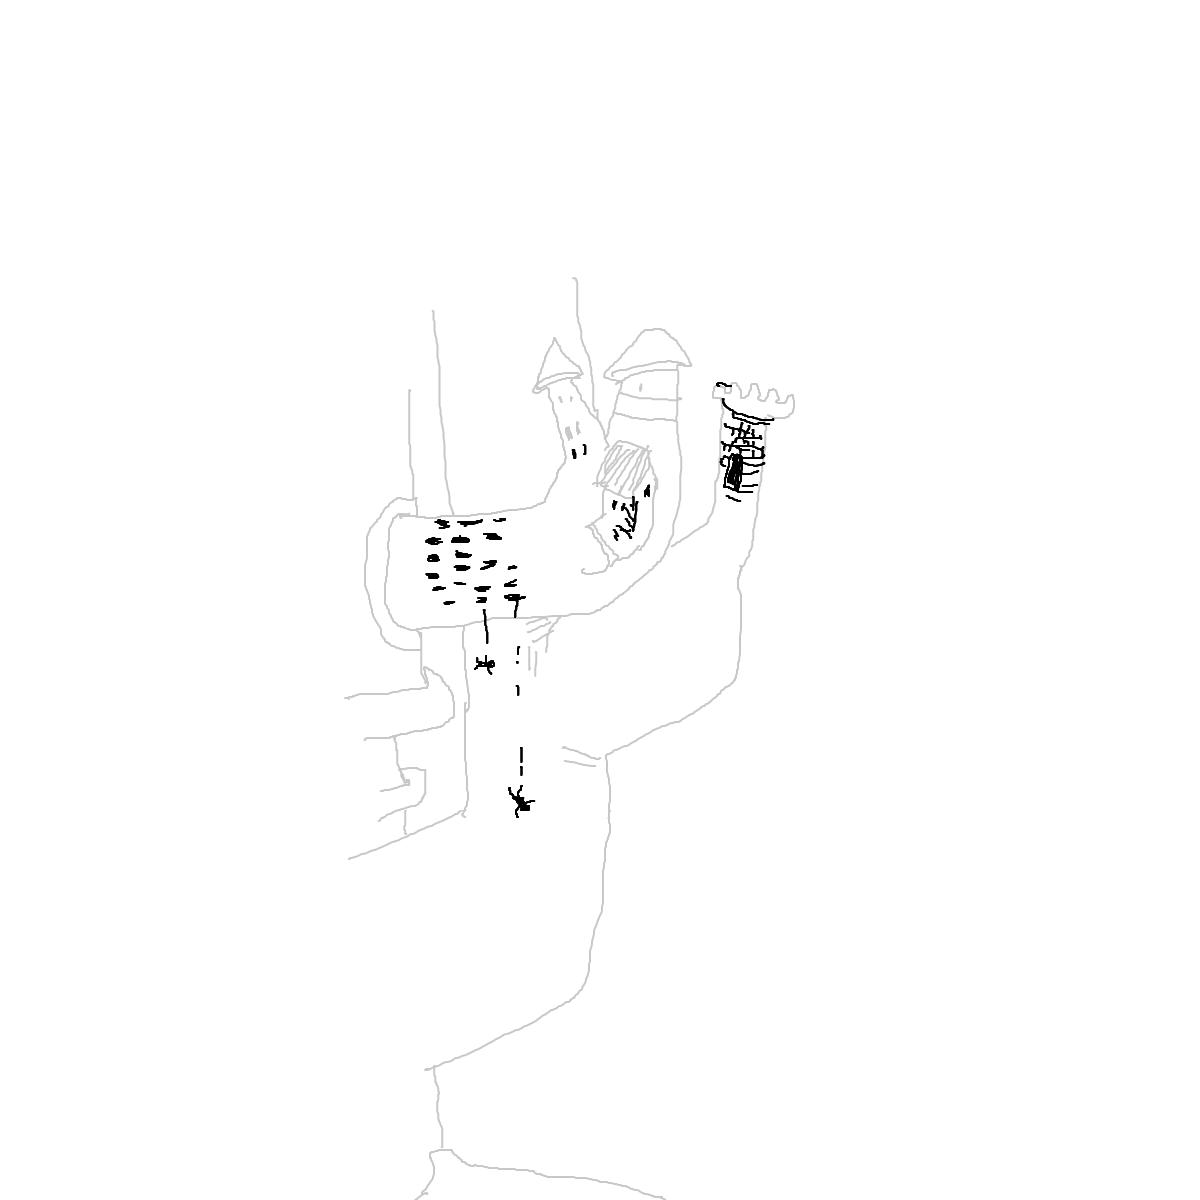 BAAAM drawing#22147 lat:78.4192352294921900lng: -4.4741554260253910